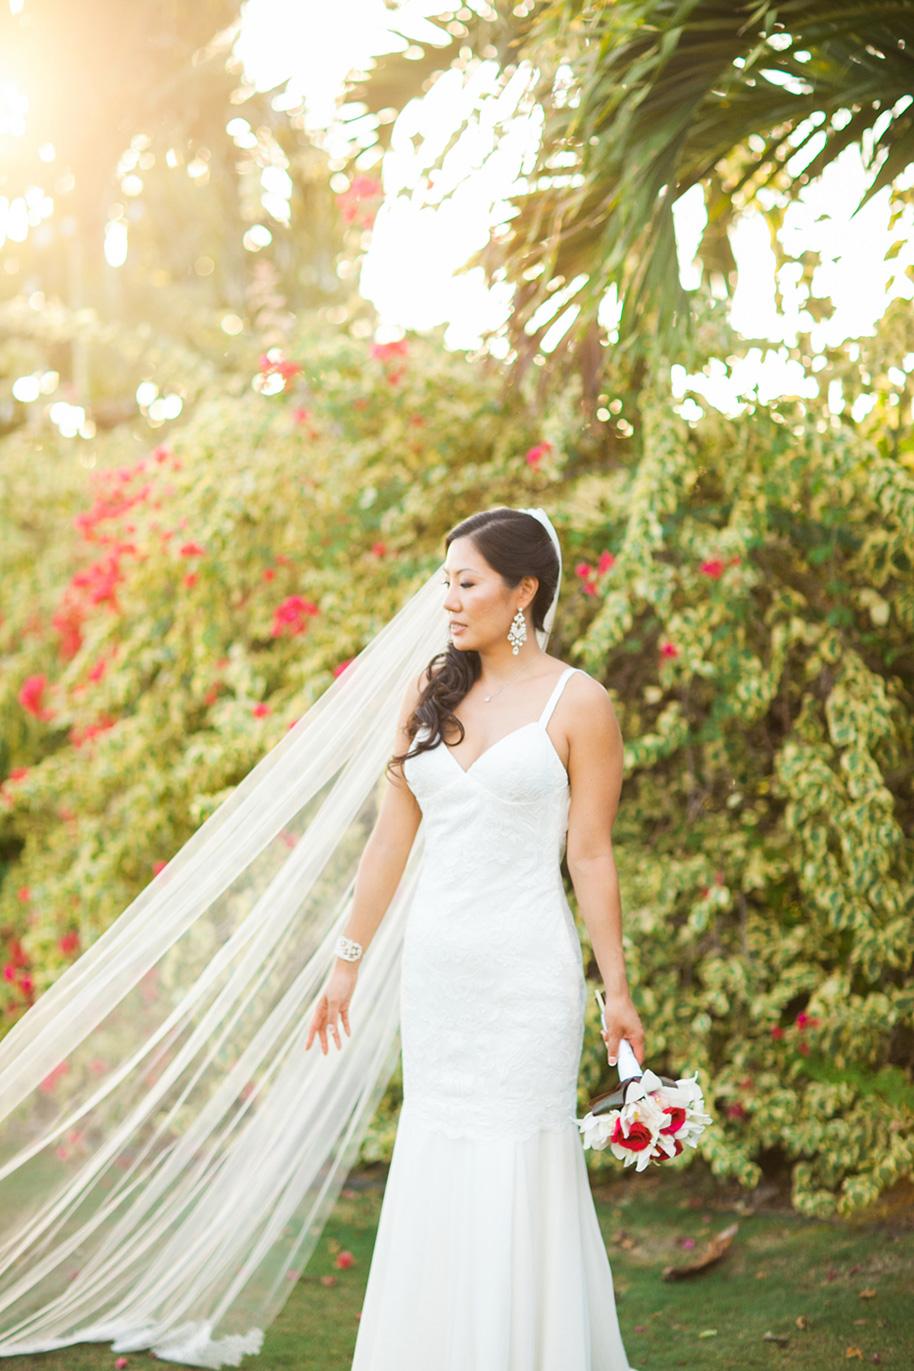 Maui-Beach-Wedding-041216-18